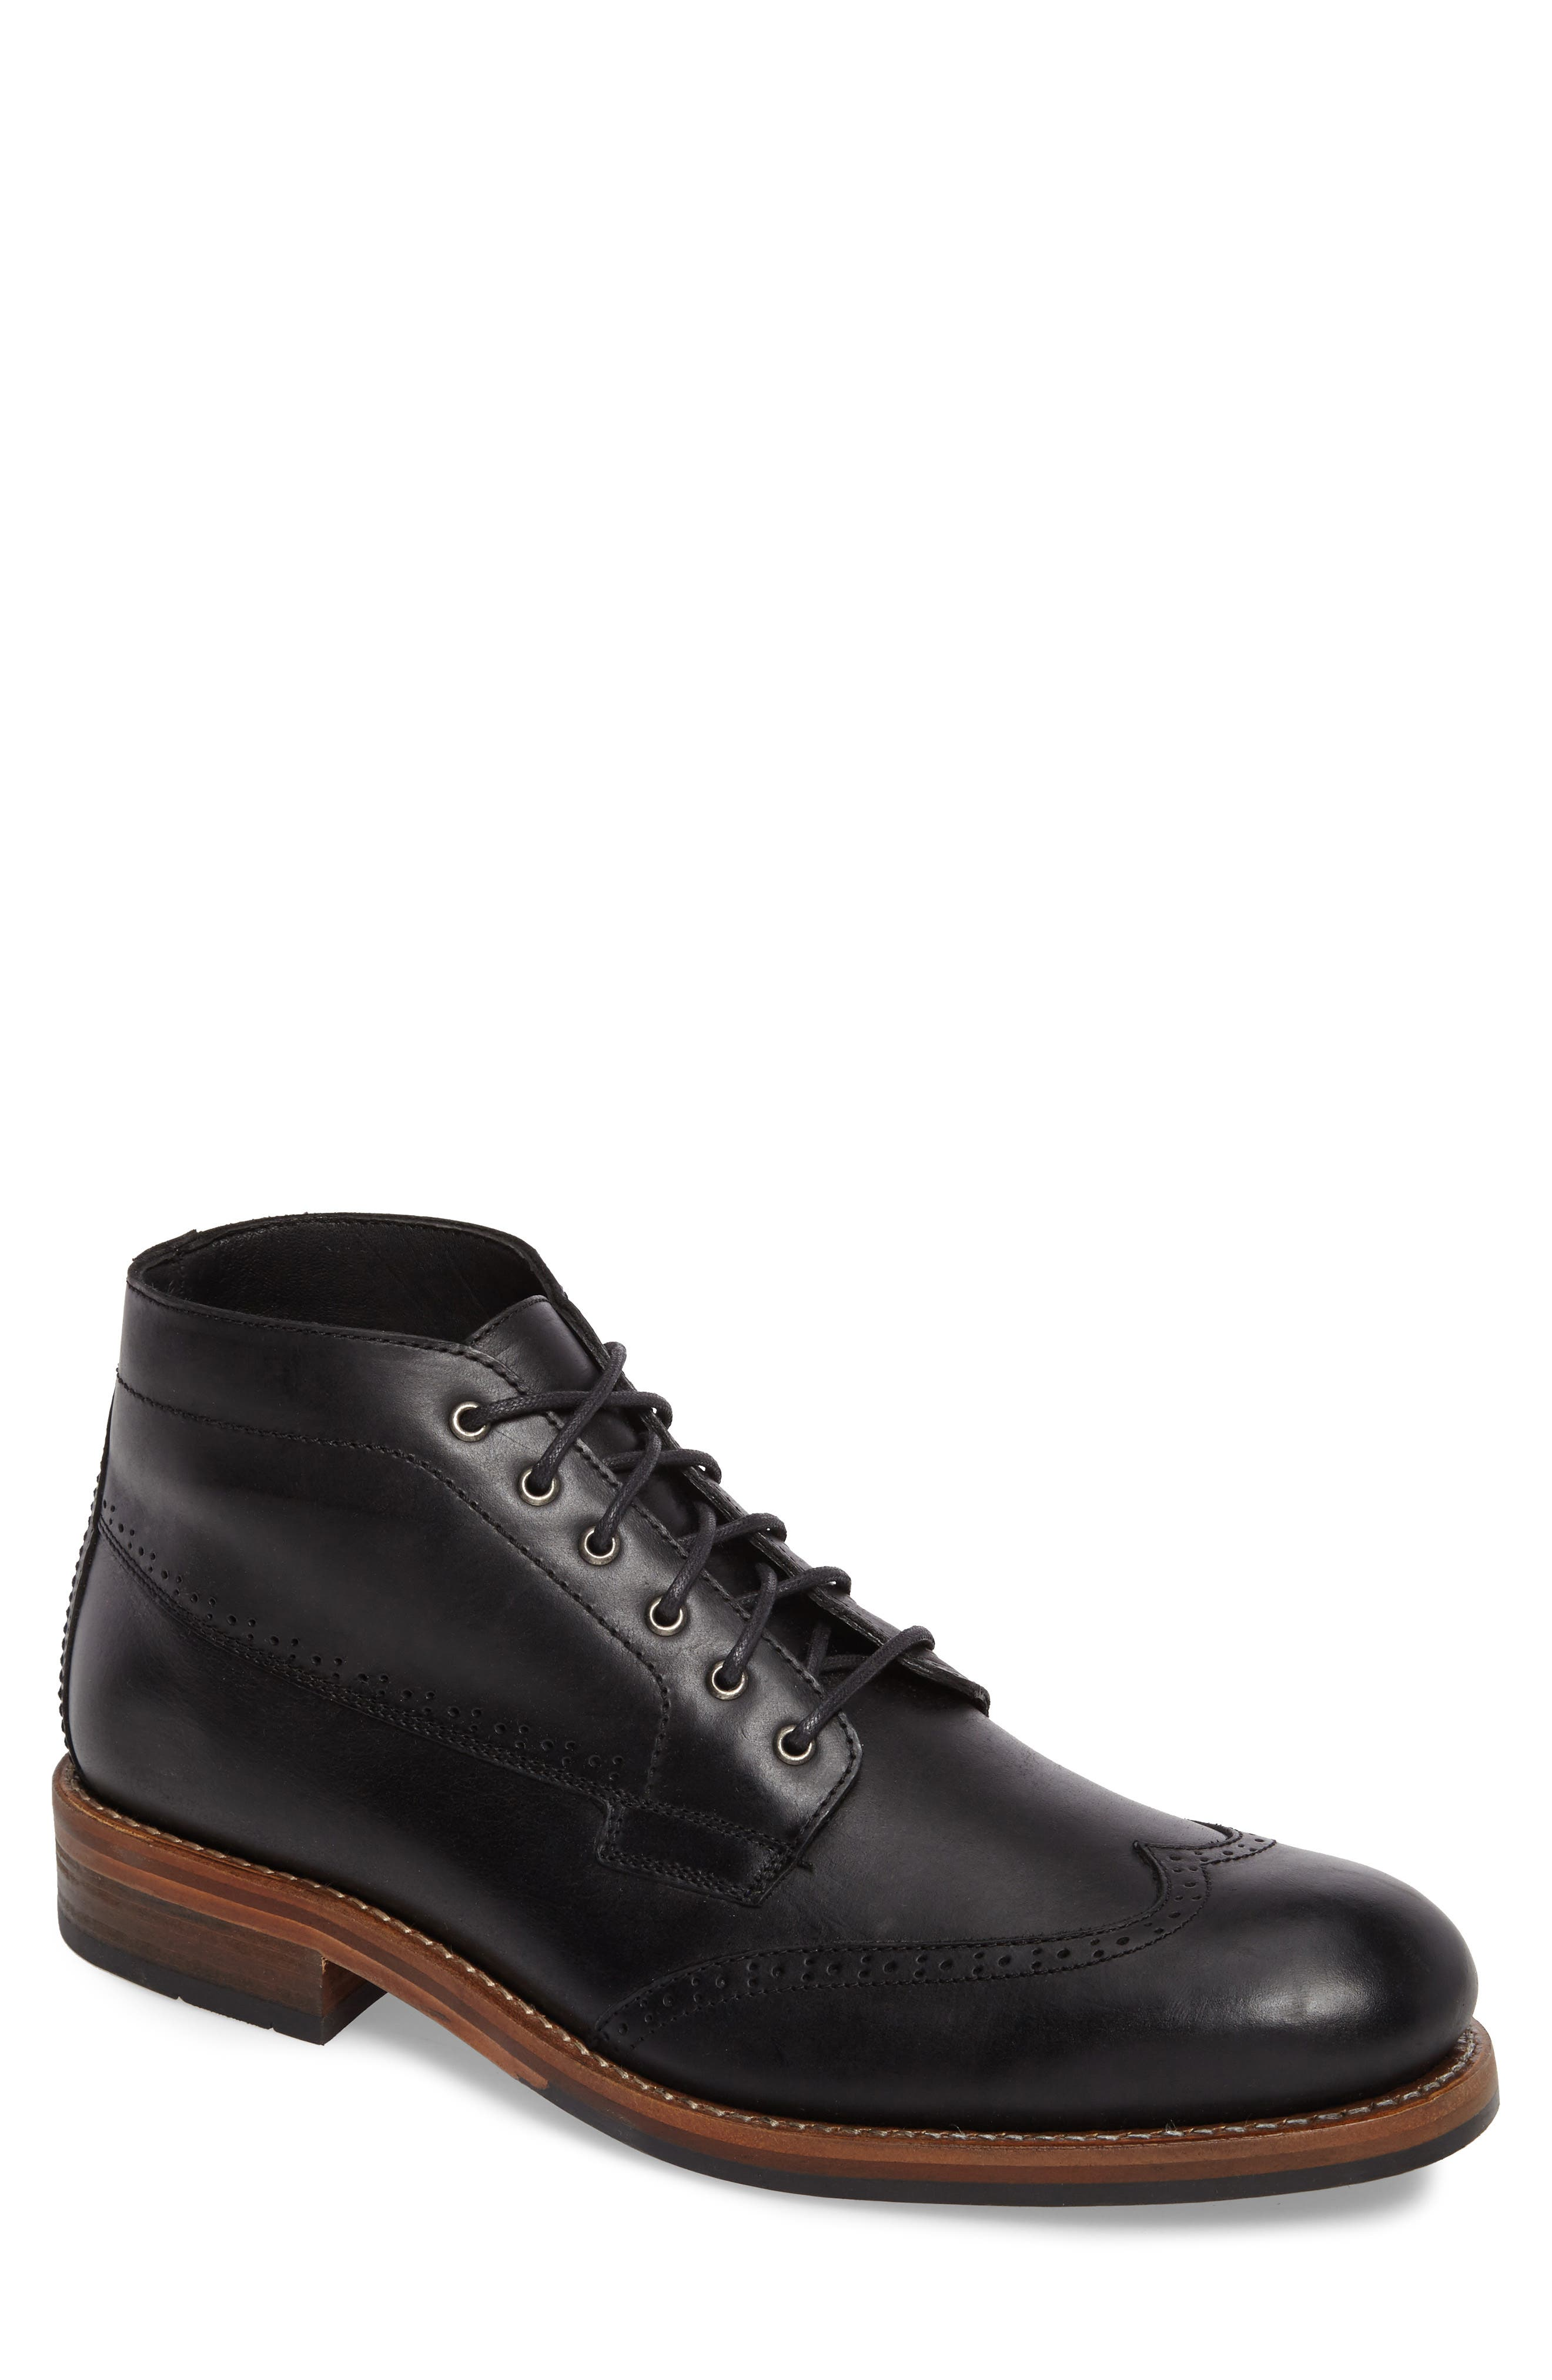 Wolverine Harwell Wingtip Boot - Black